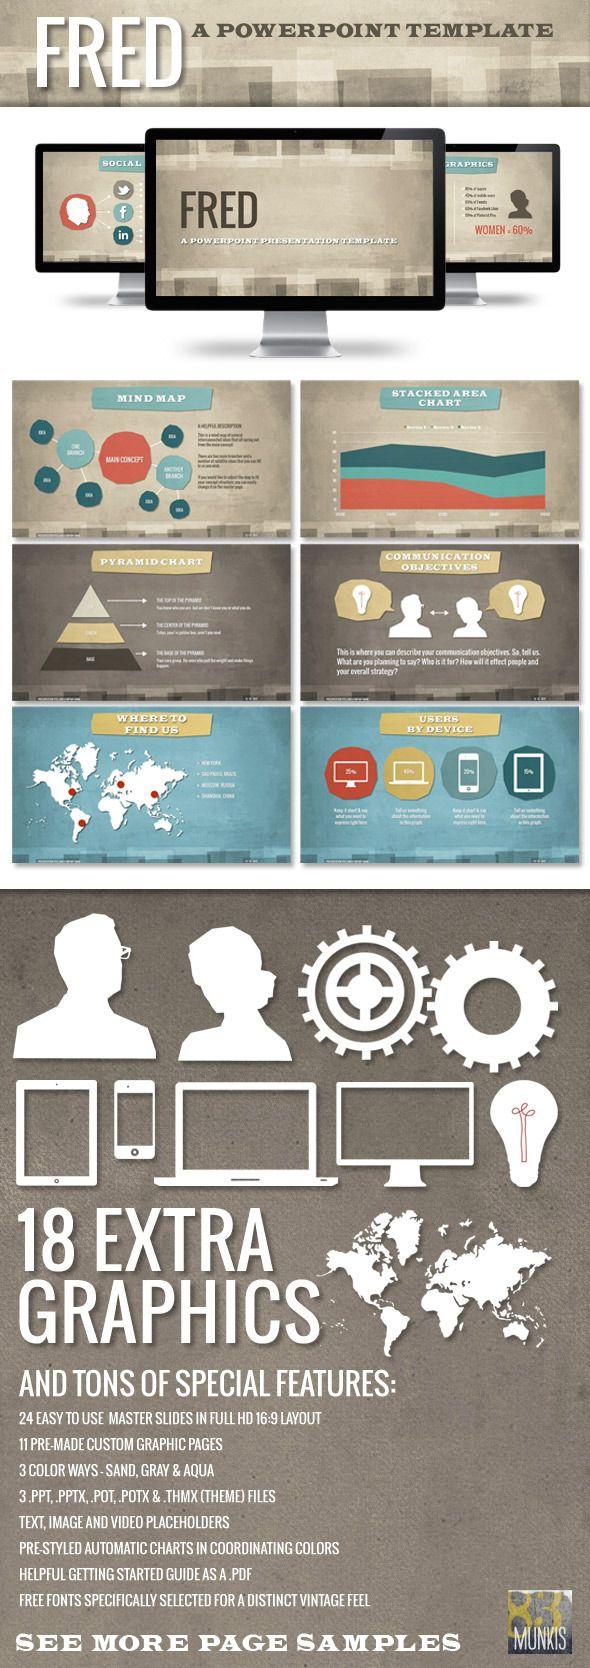 Best 25 professional powerpoint presentation ideas on pinterest fred professional powerpoint presentation template toneelgroepblik Choice Image